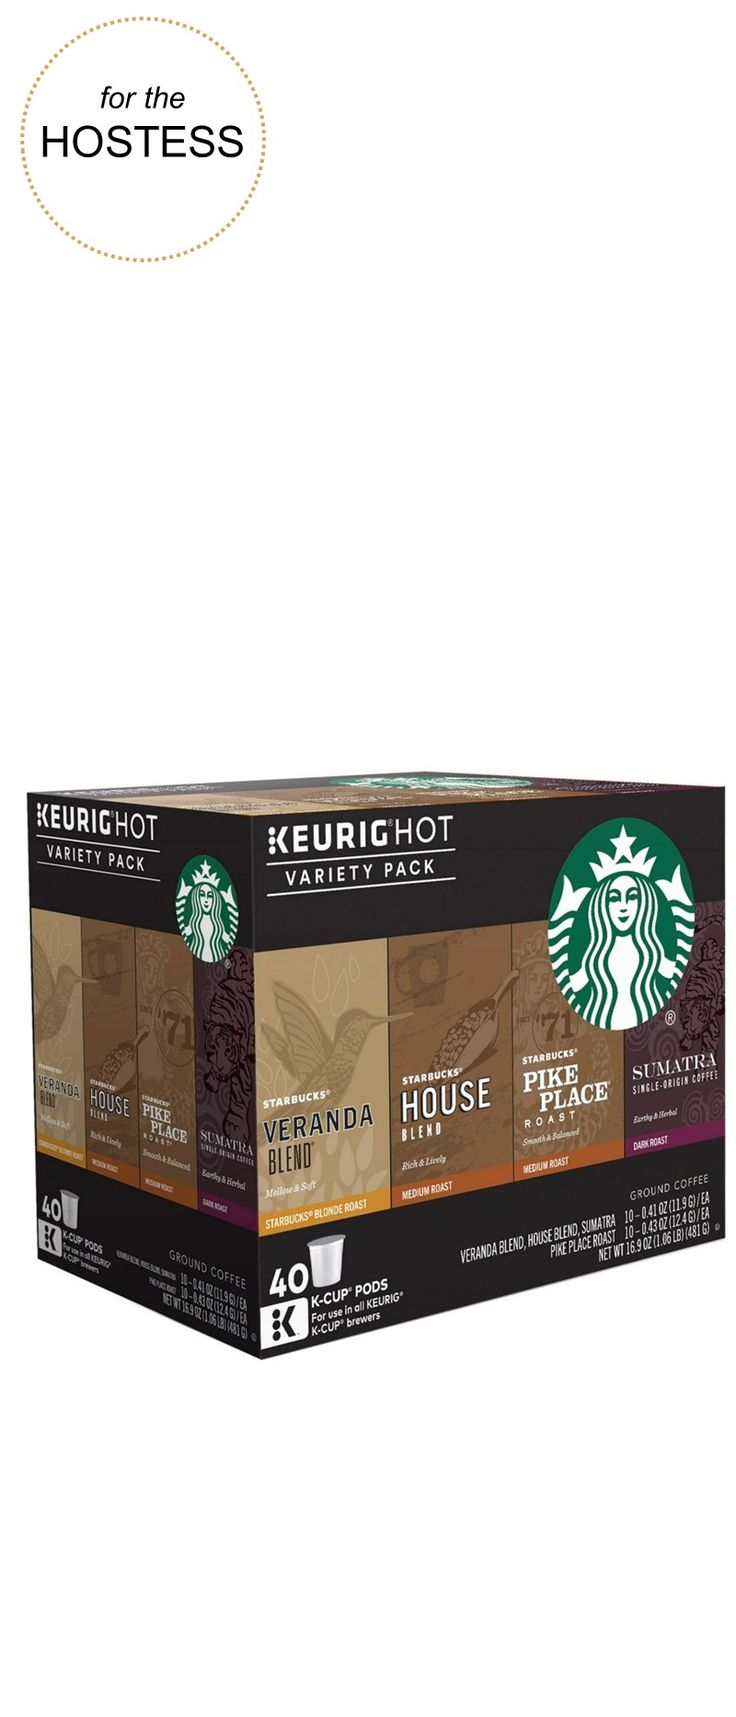 For the hostess keurig starbucks coffee 40pk variety